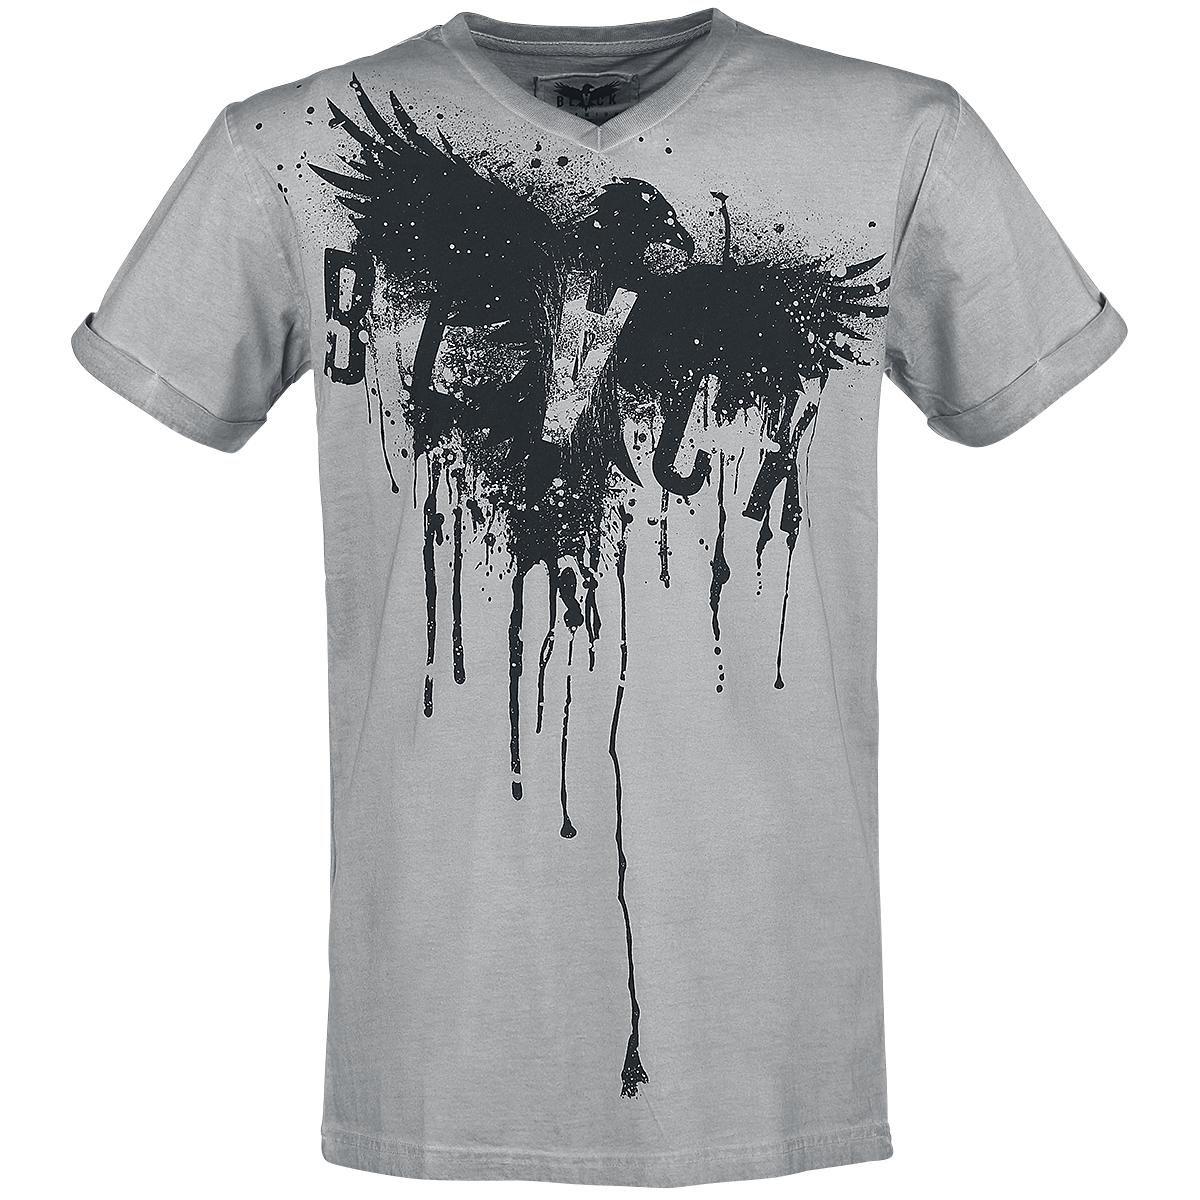 "Black Premium by EMP Camiseta ""Splattered Eagle"" Gris • Amplia selección • EMP"